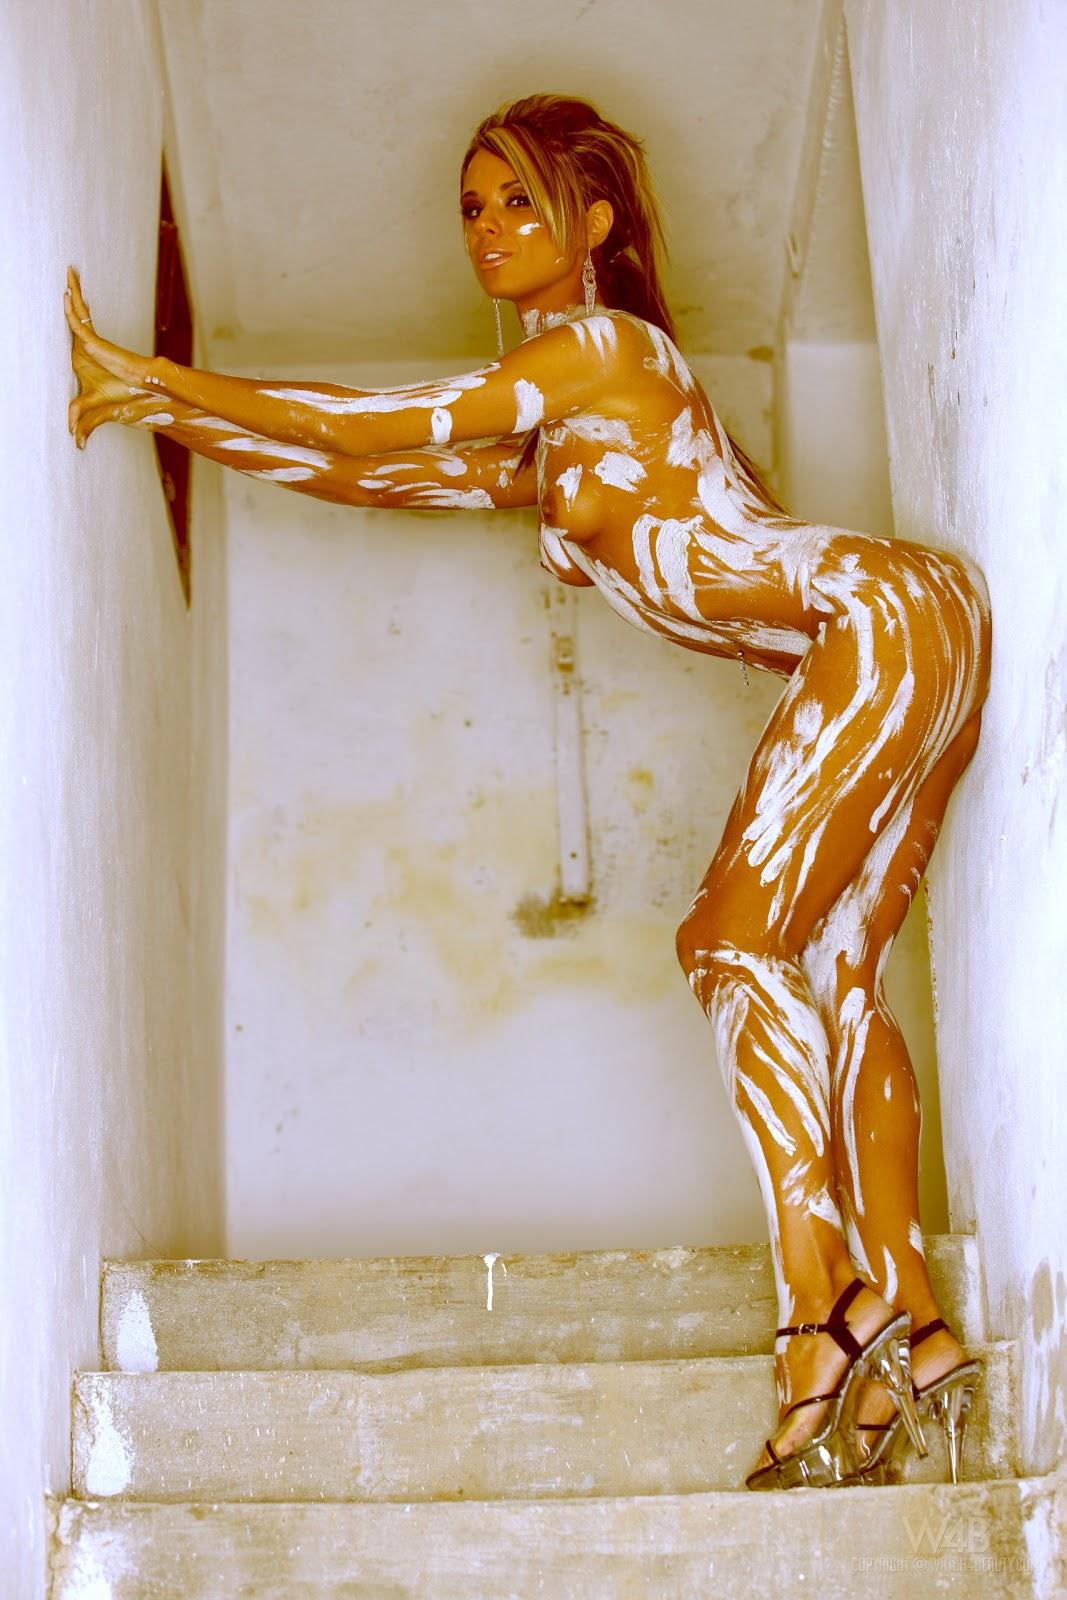 Эротика измазалась красками фото 501-280